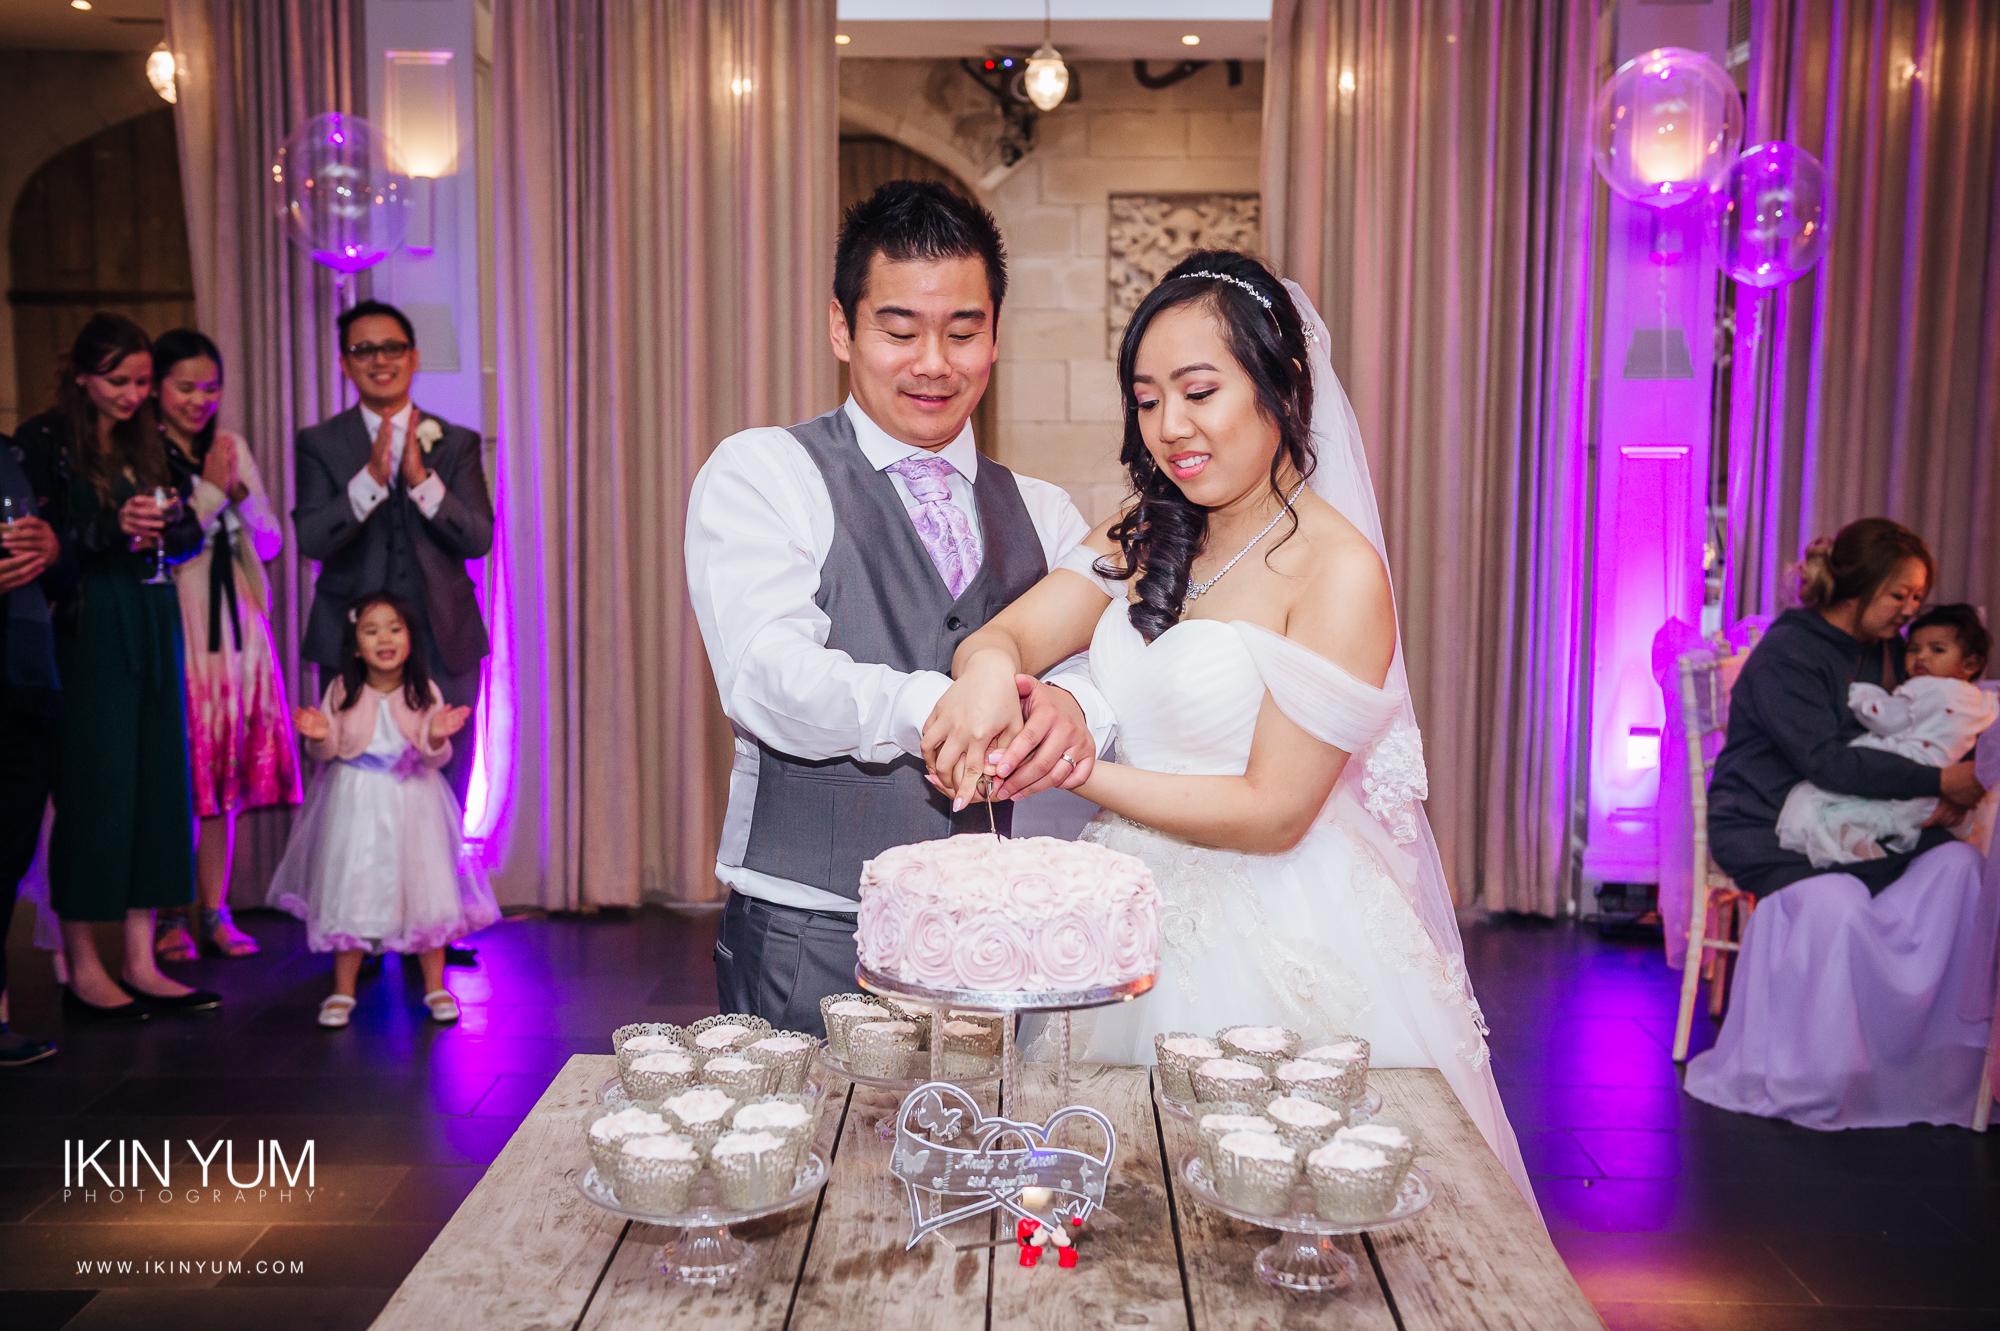 Hampton Manor Wedding - Ikin Yum Photography -157.jpg